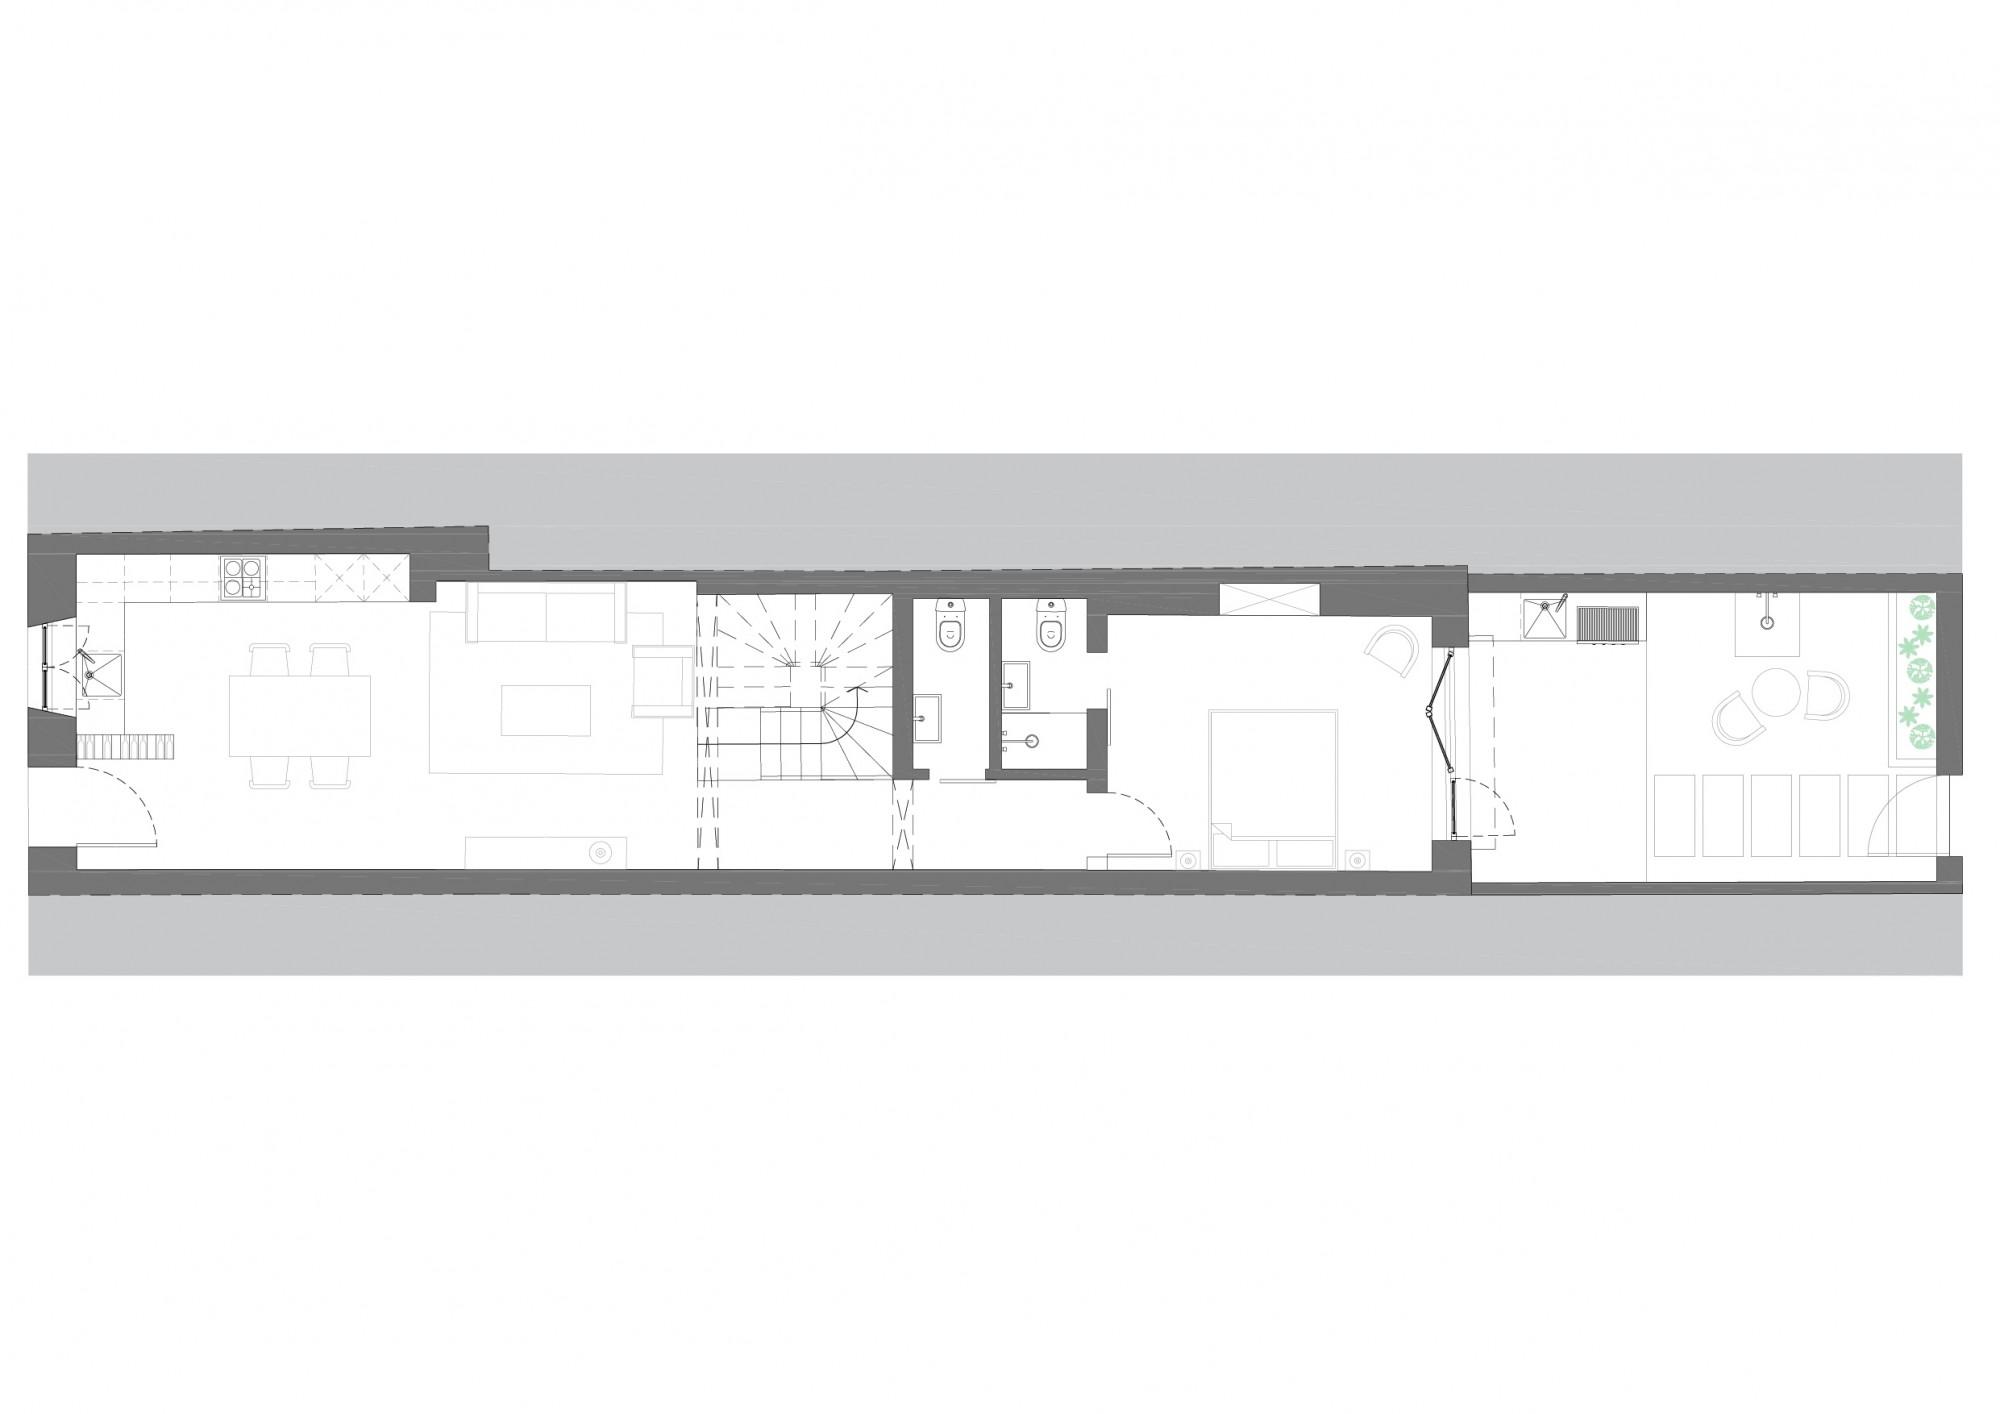 Piso 1 / Ground Floor